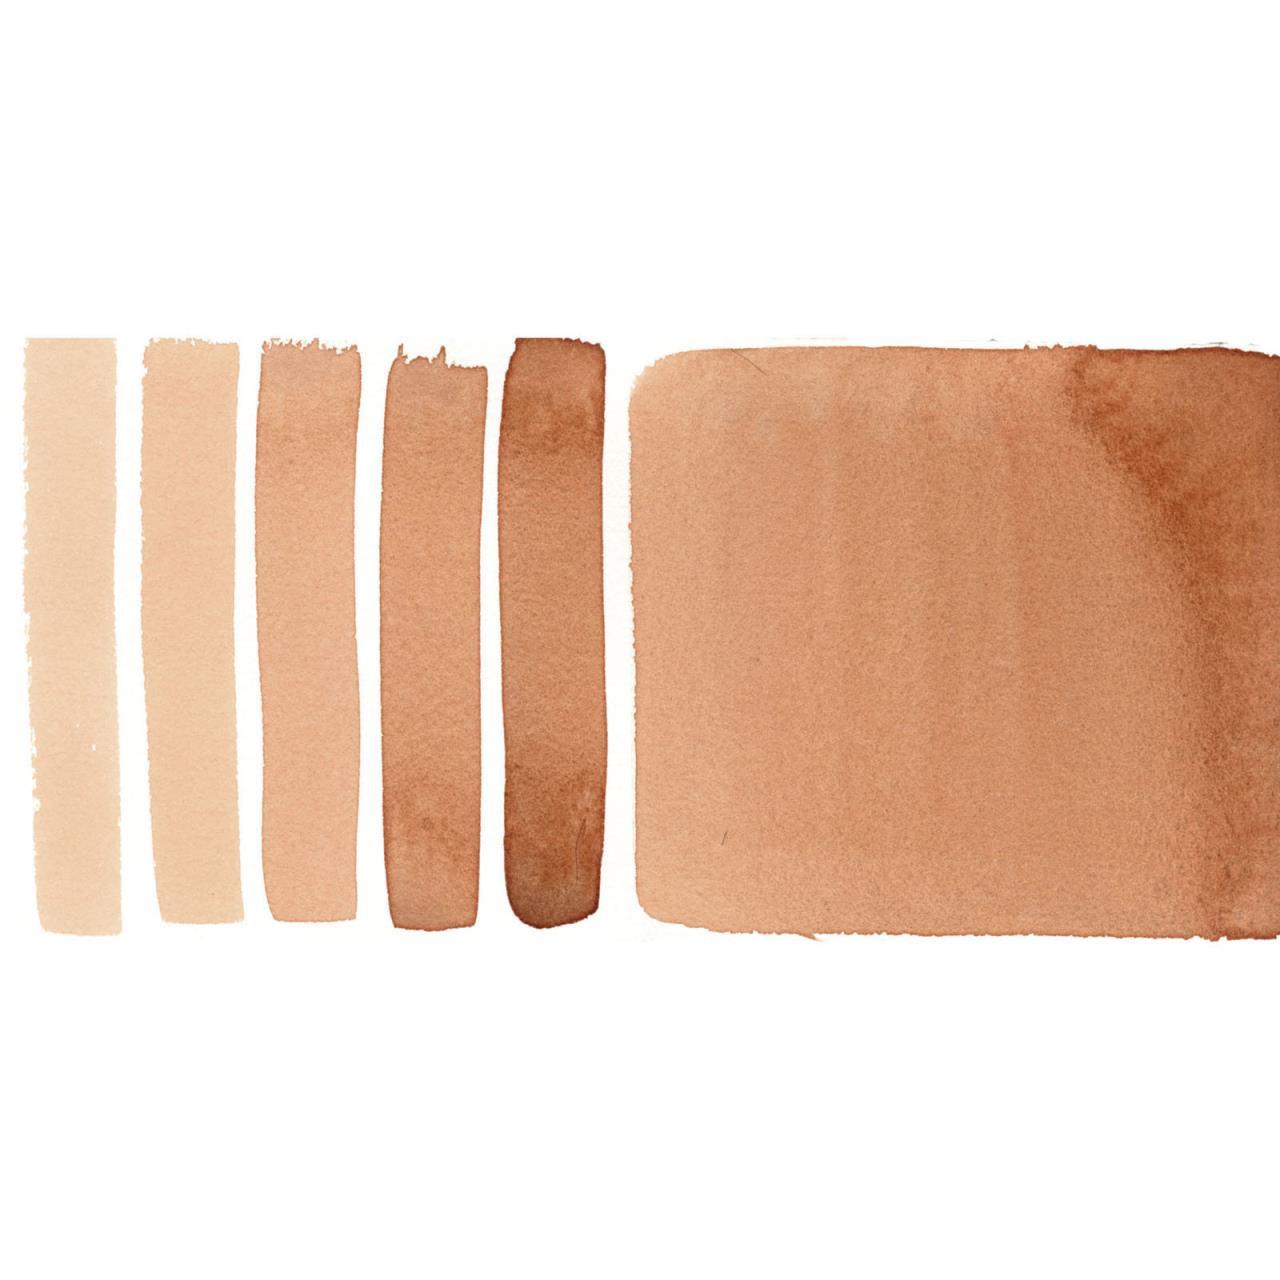 Burnt Sienna Light, DANIEL SMITH Extra Fine Watercolors 15ml Tubes - 743162033324